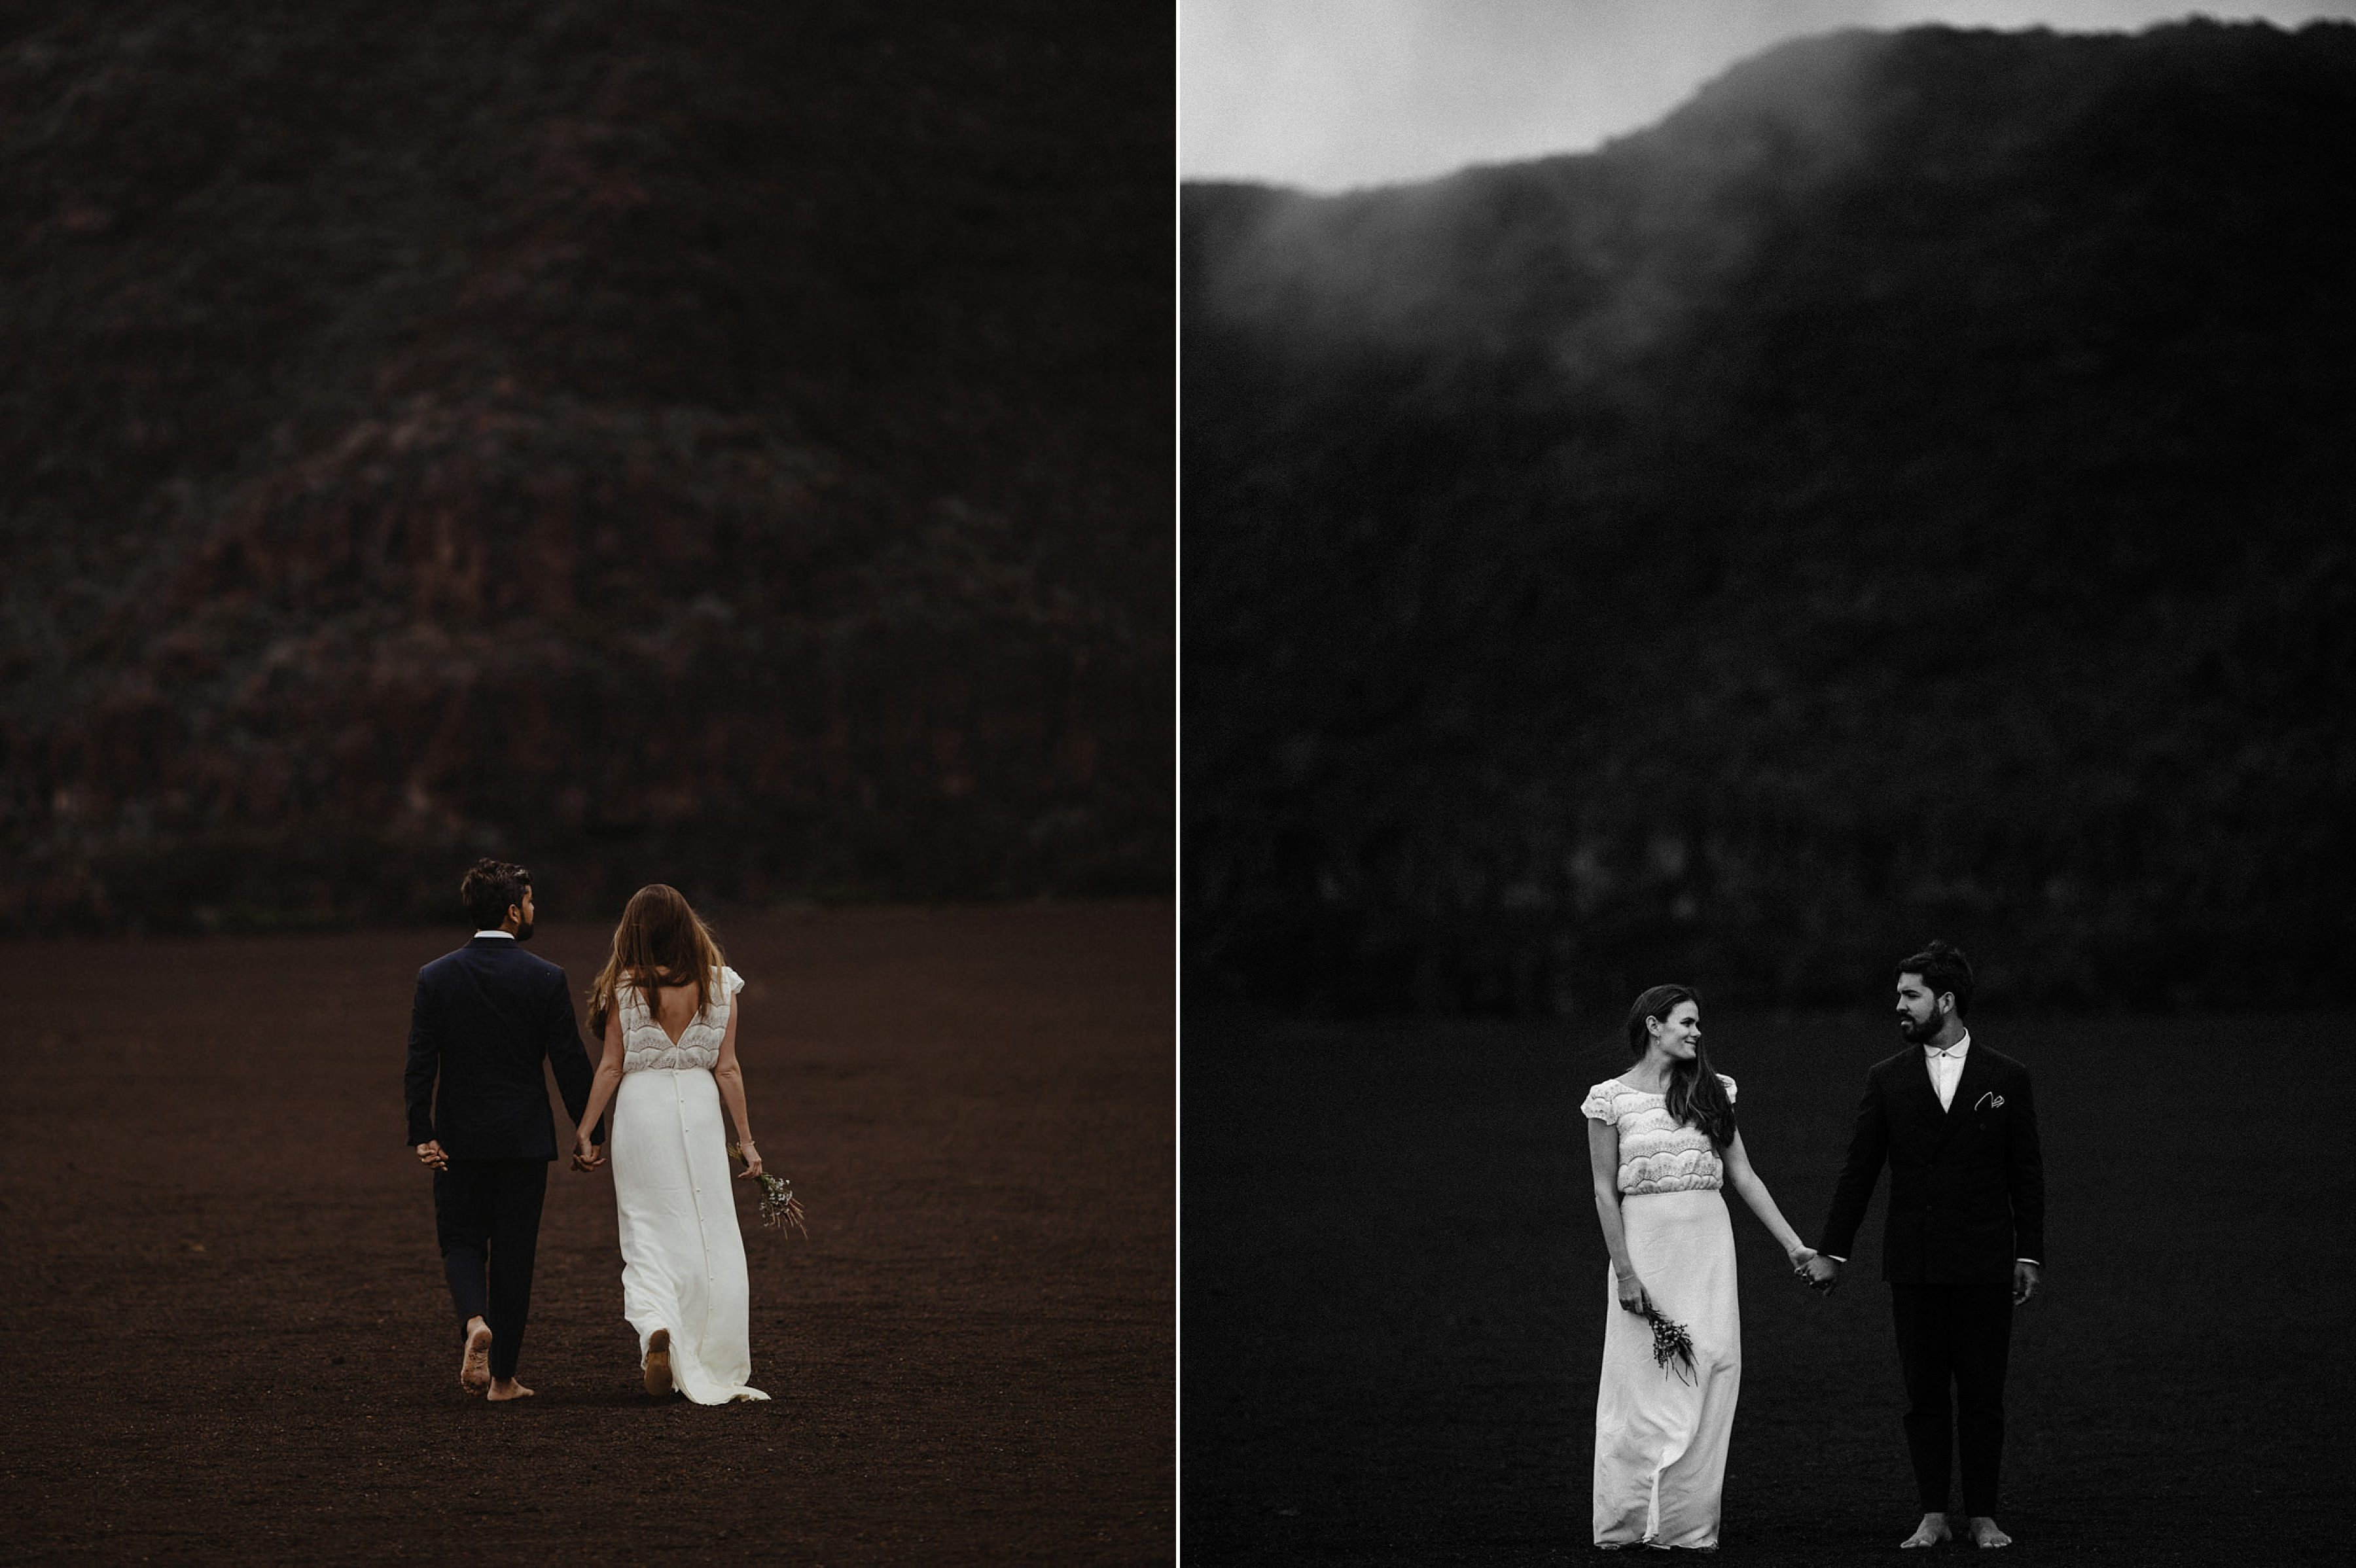 capyture-wedding-photographer-destination-nature_0834